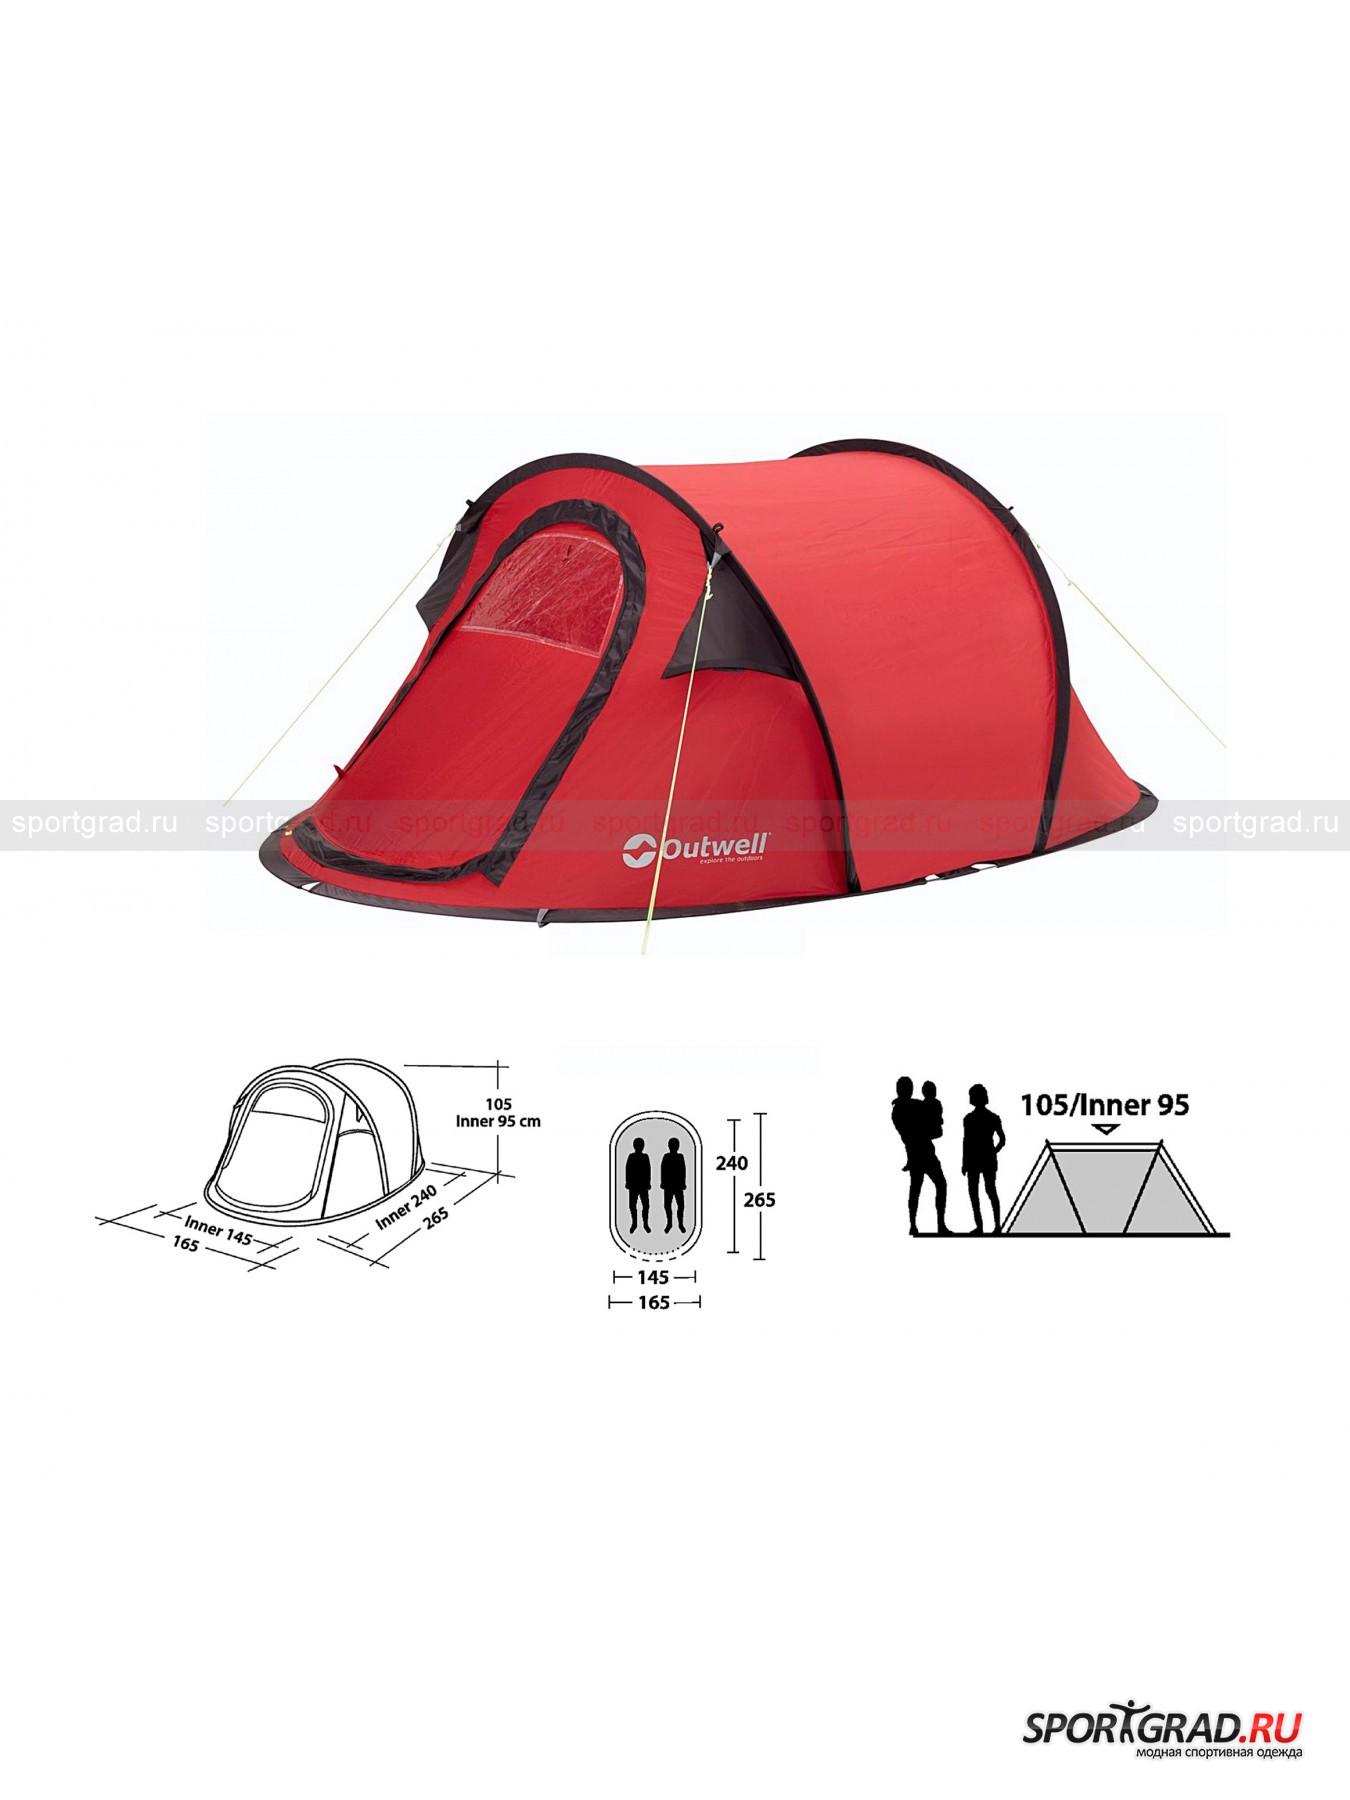 Палатка Vision 200 OUTWELL от Спортград